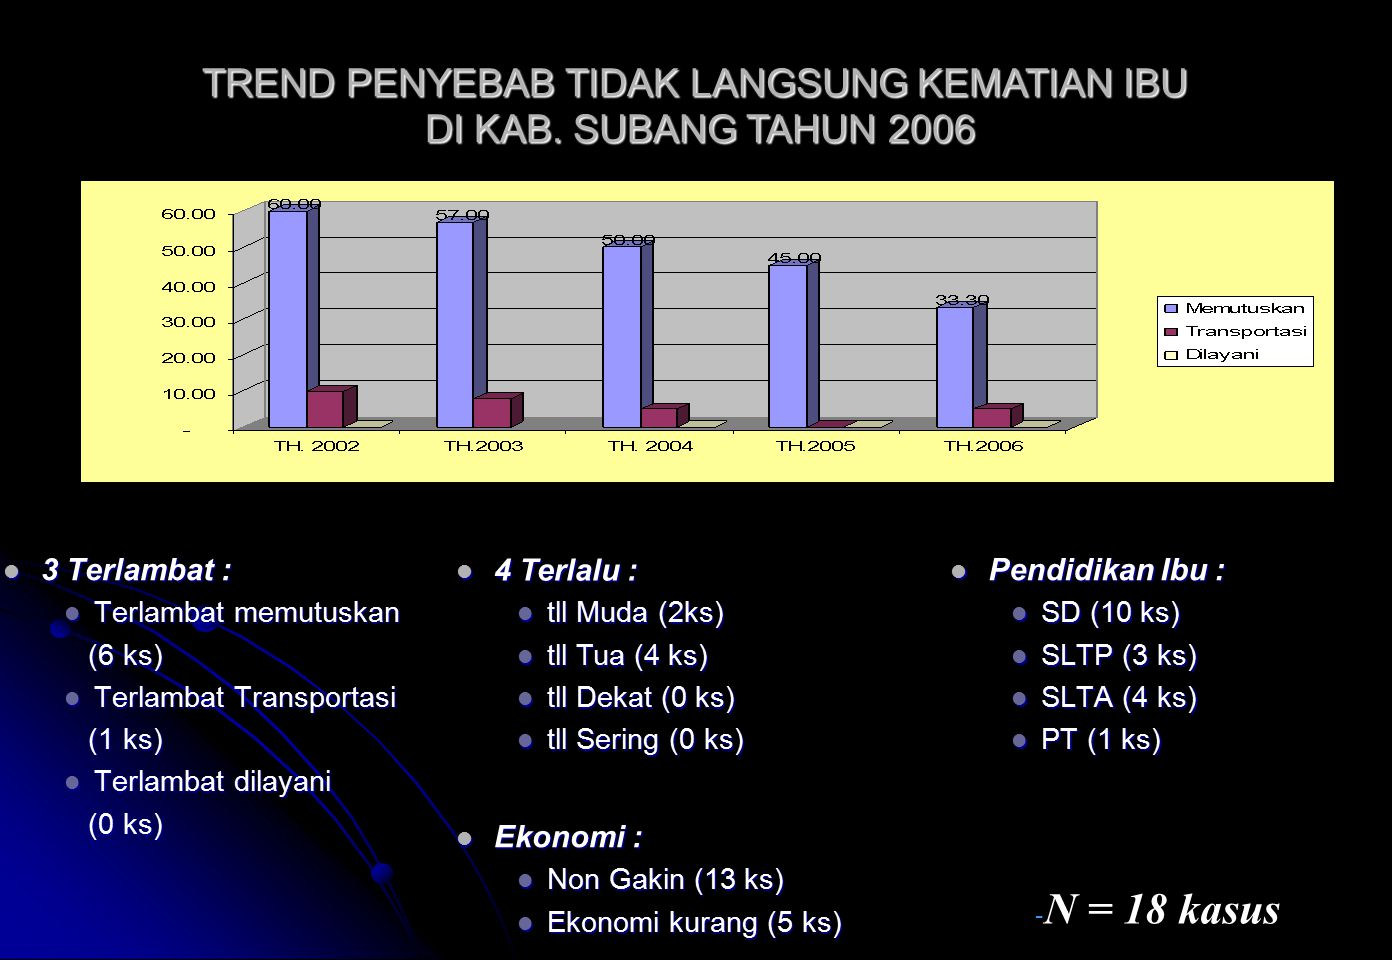 TREND PENYEBAB TIDAK LANGSUNG KEMATIAN IBU DI KAB. SUBANG TAHUN 2006